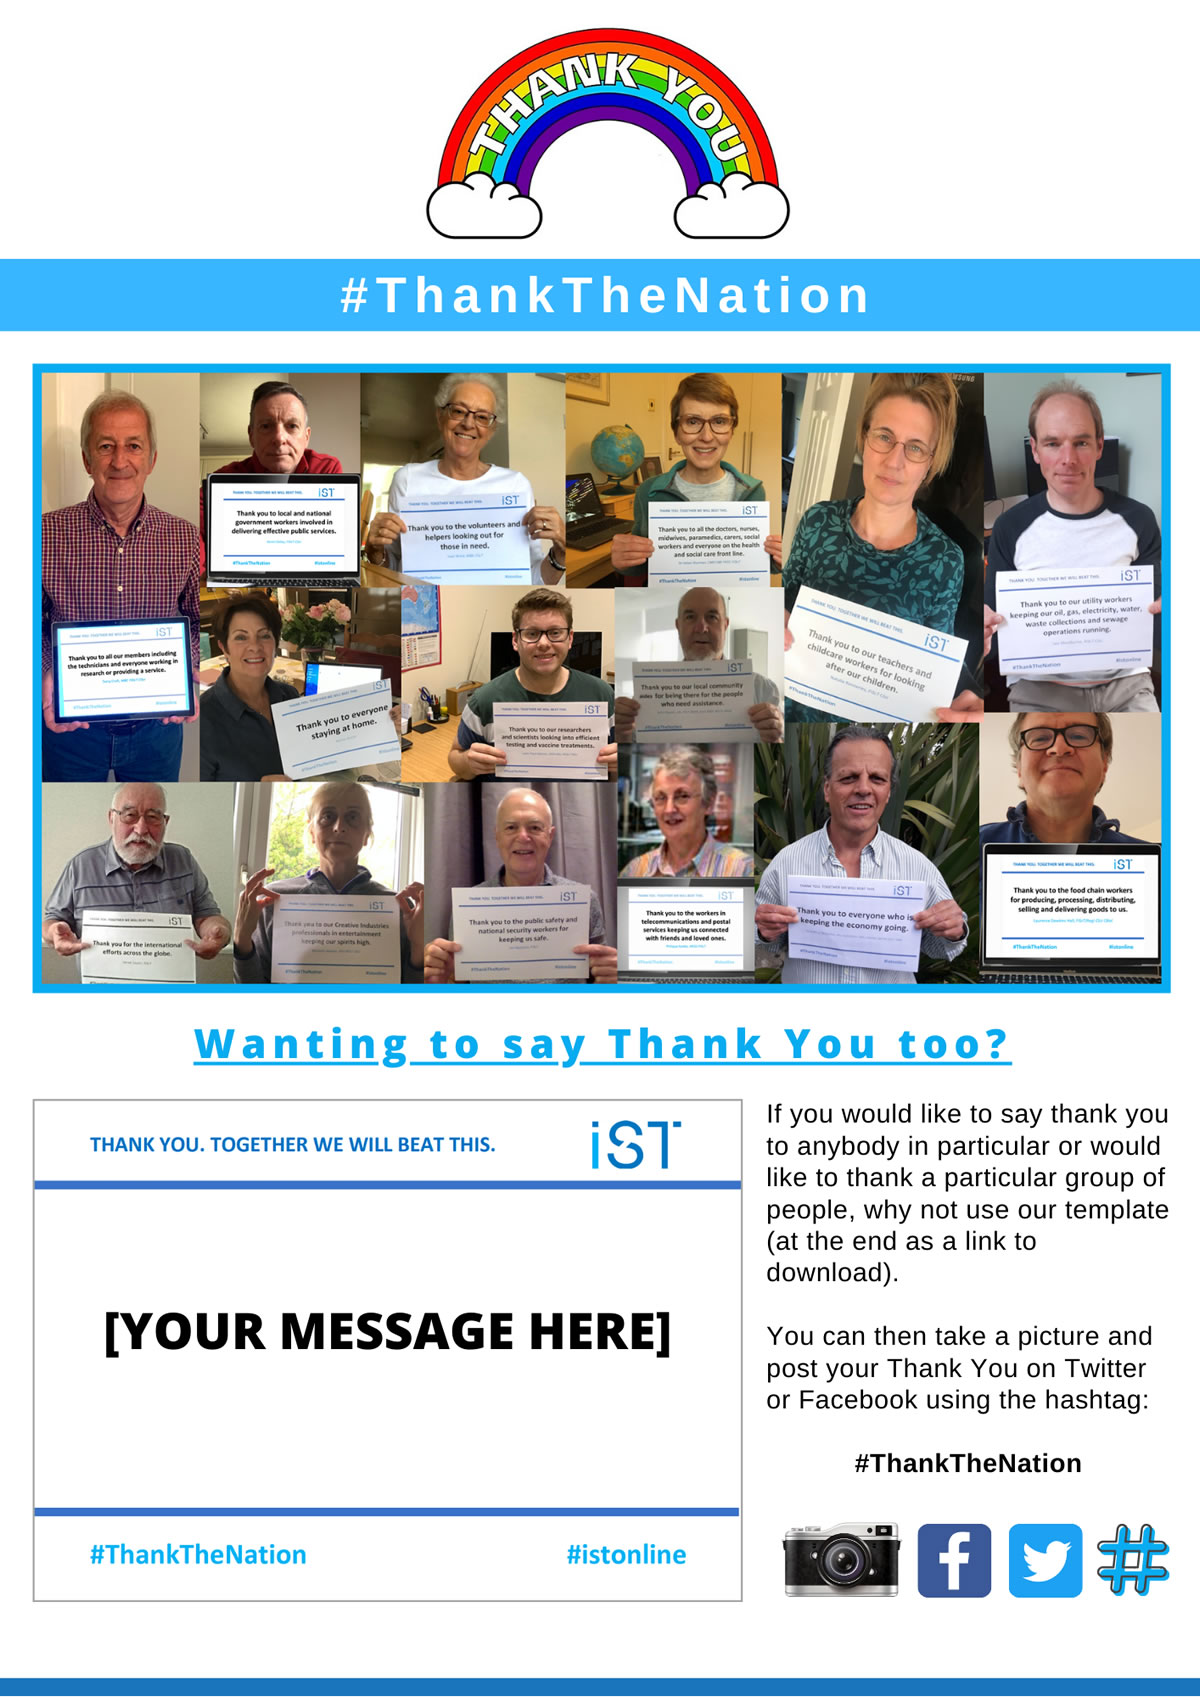 thankthenation